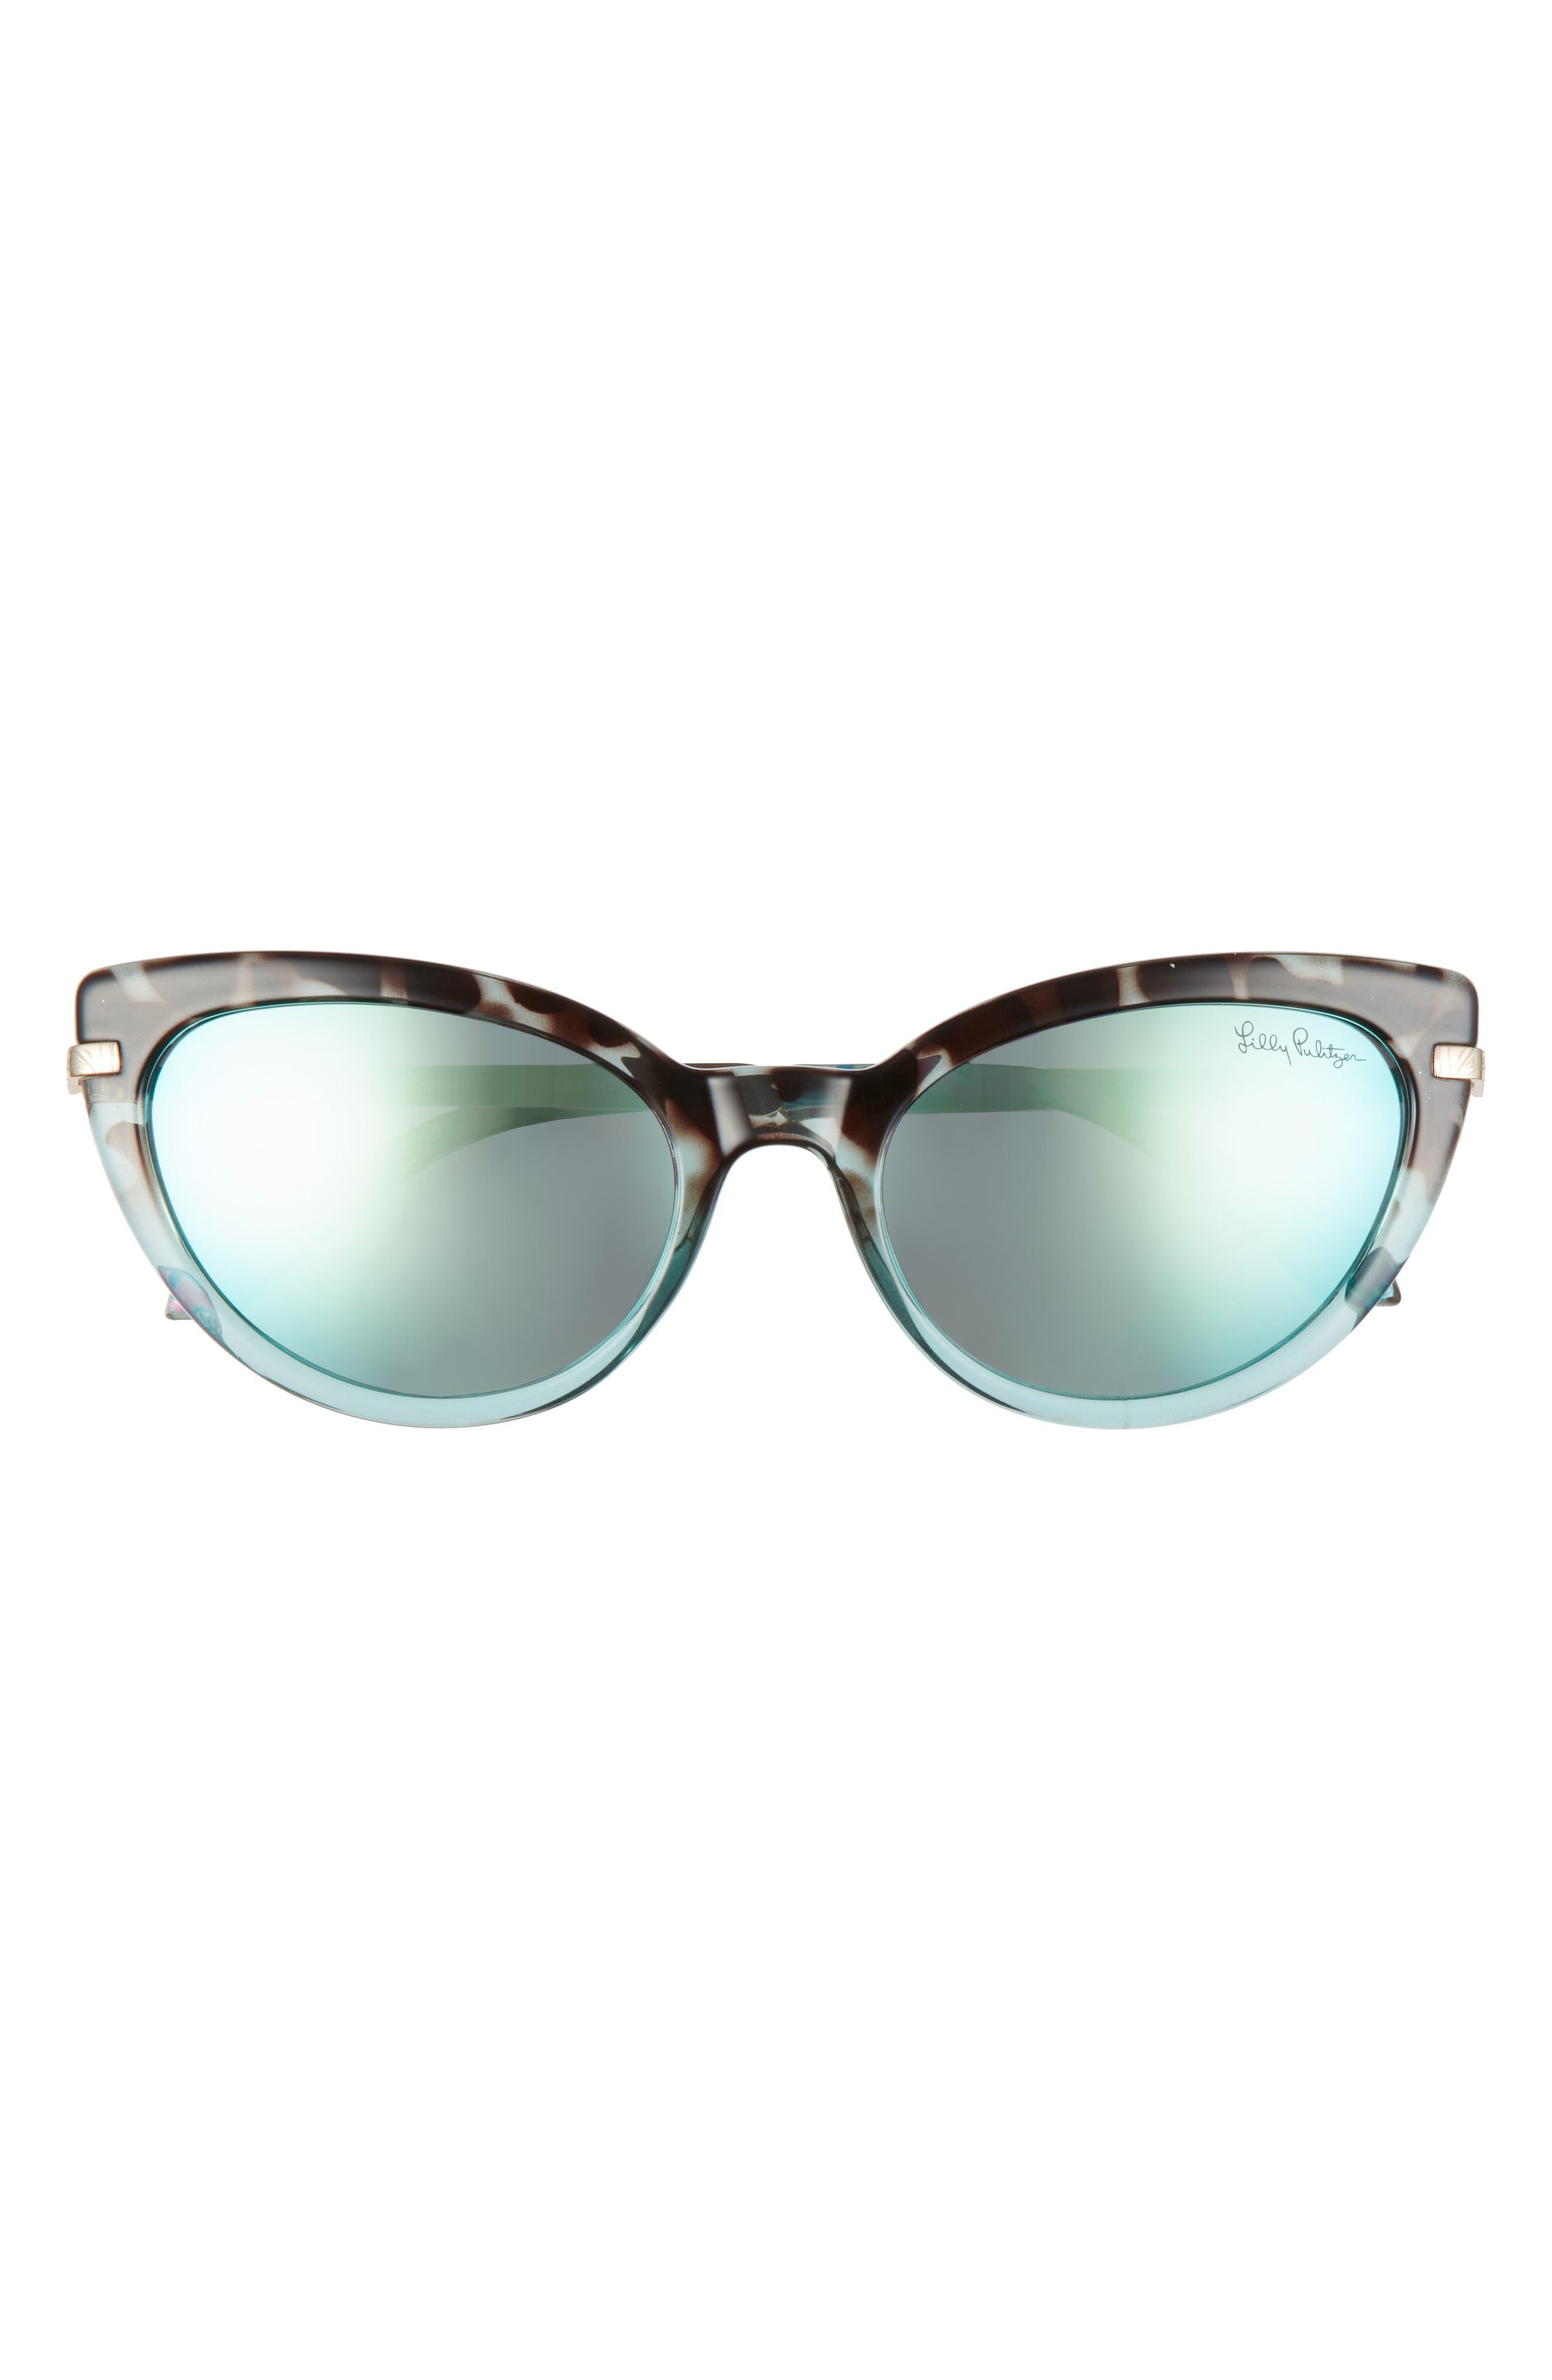 Women's Lilly Pulitzer Halona 55mm Polarized Cat Eye Sunglasses